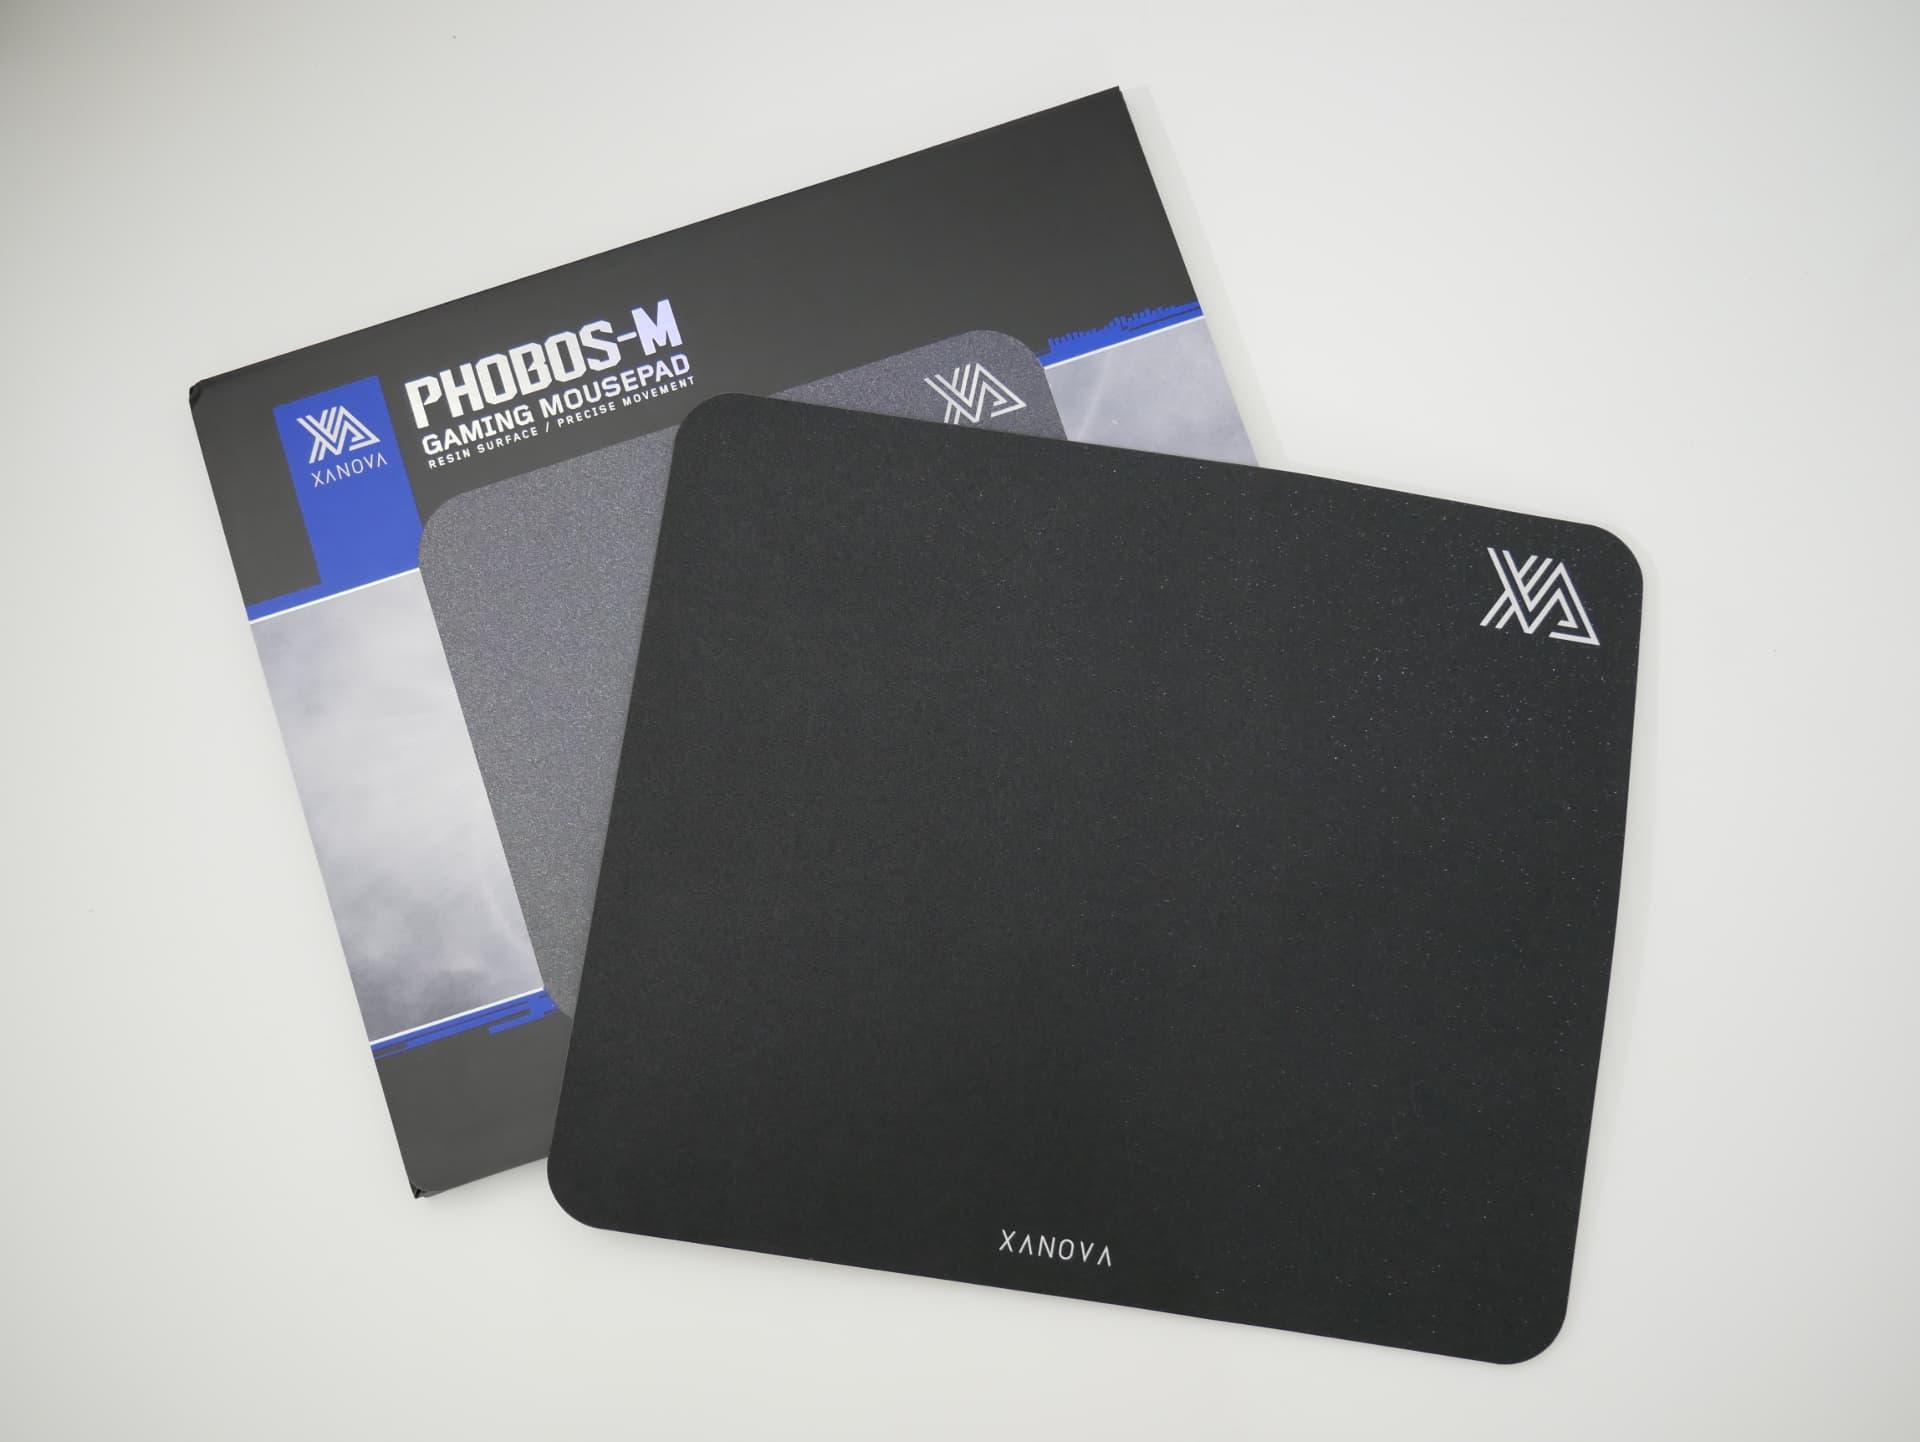 「XANOVA Phobos M」レビュー。プラスチック製だけどクッション性のある、特殊な構造のゲーミングマウスパッド